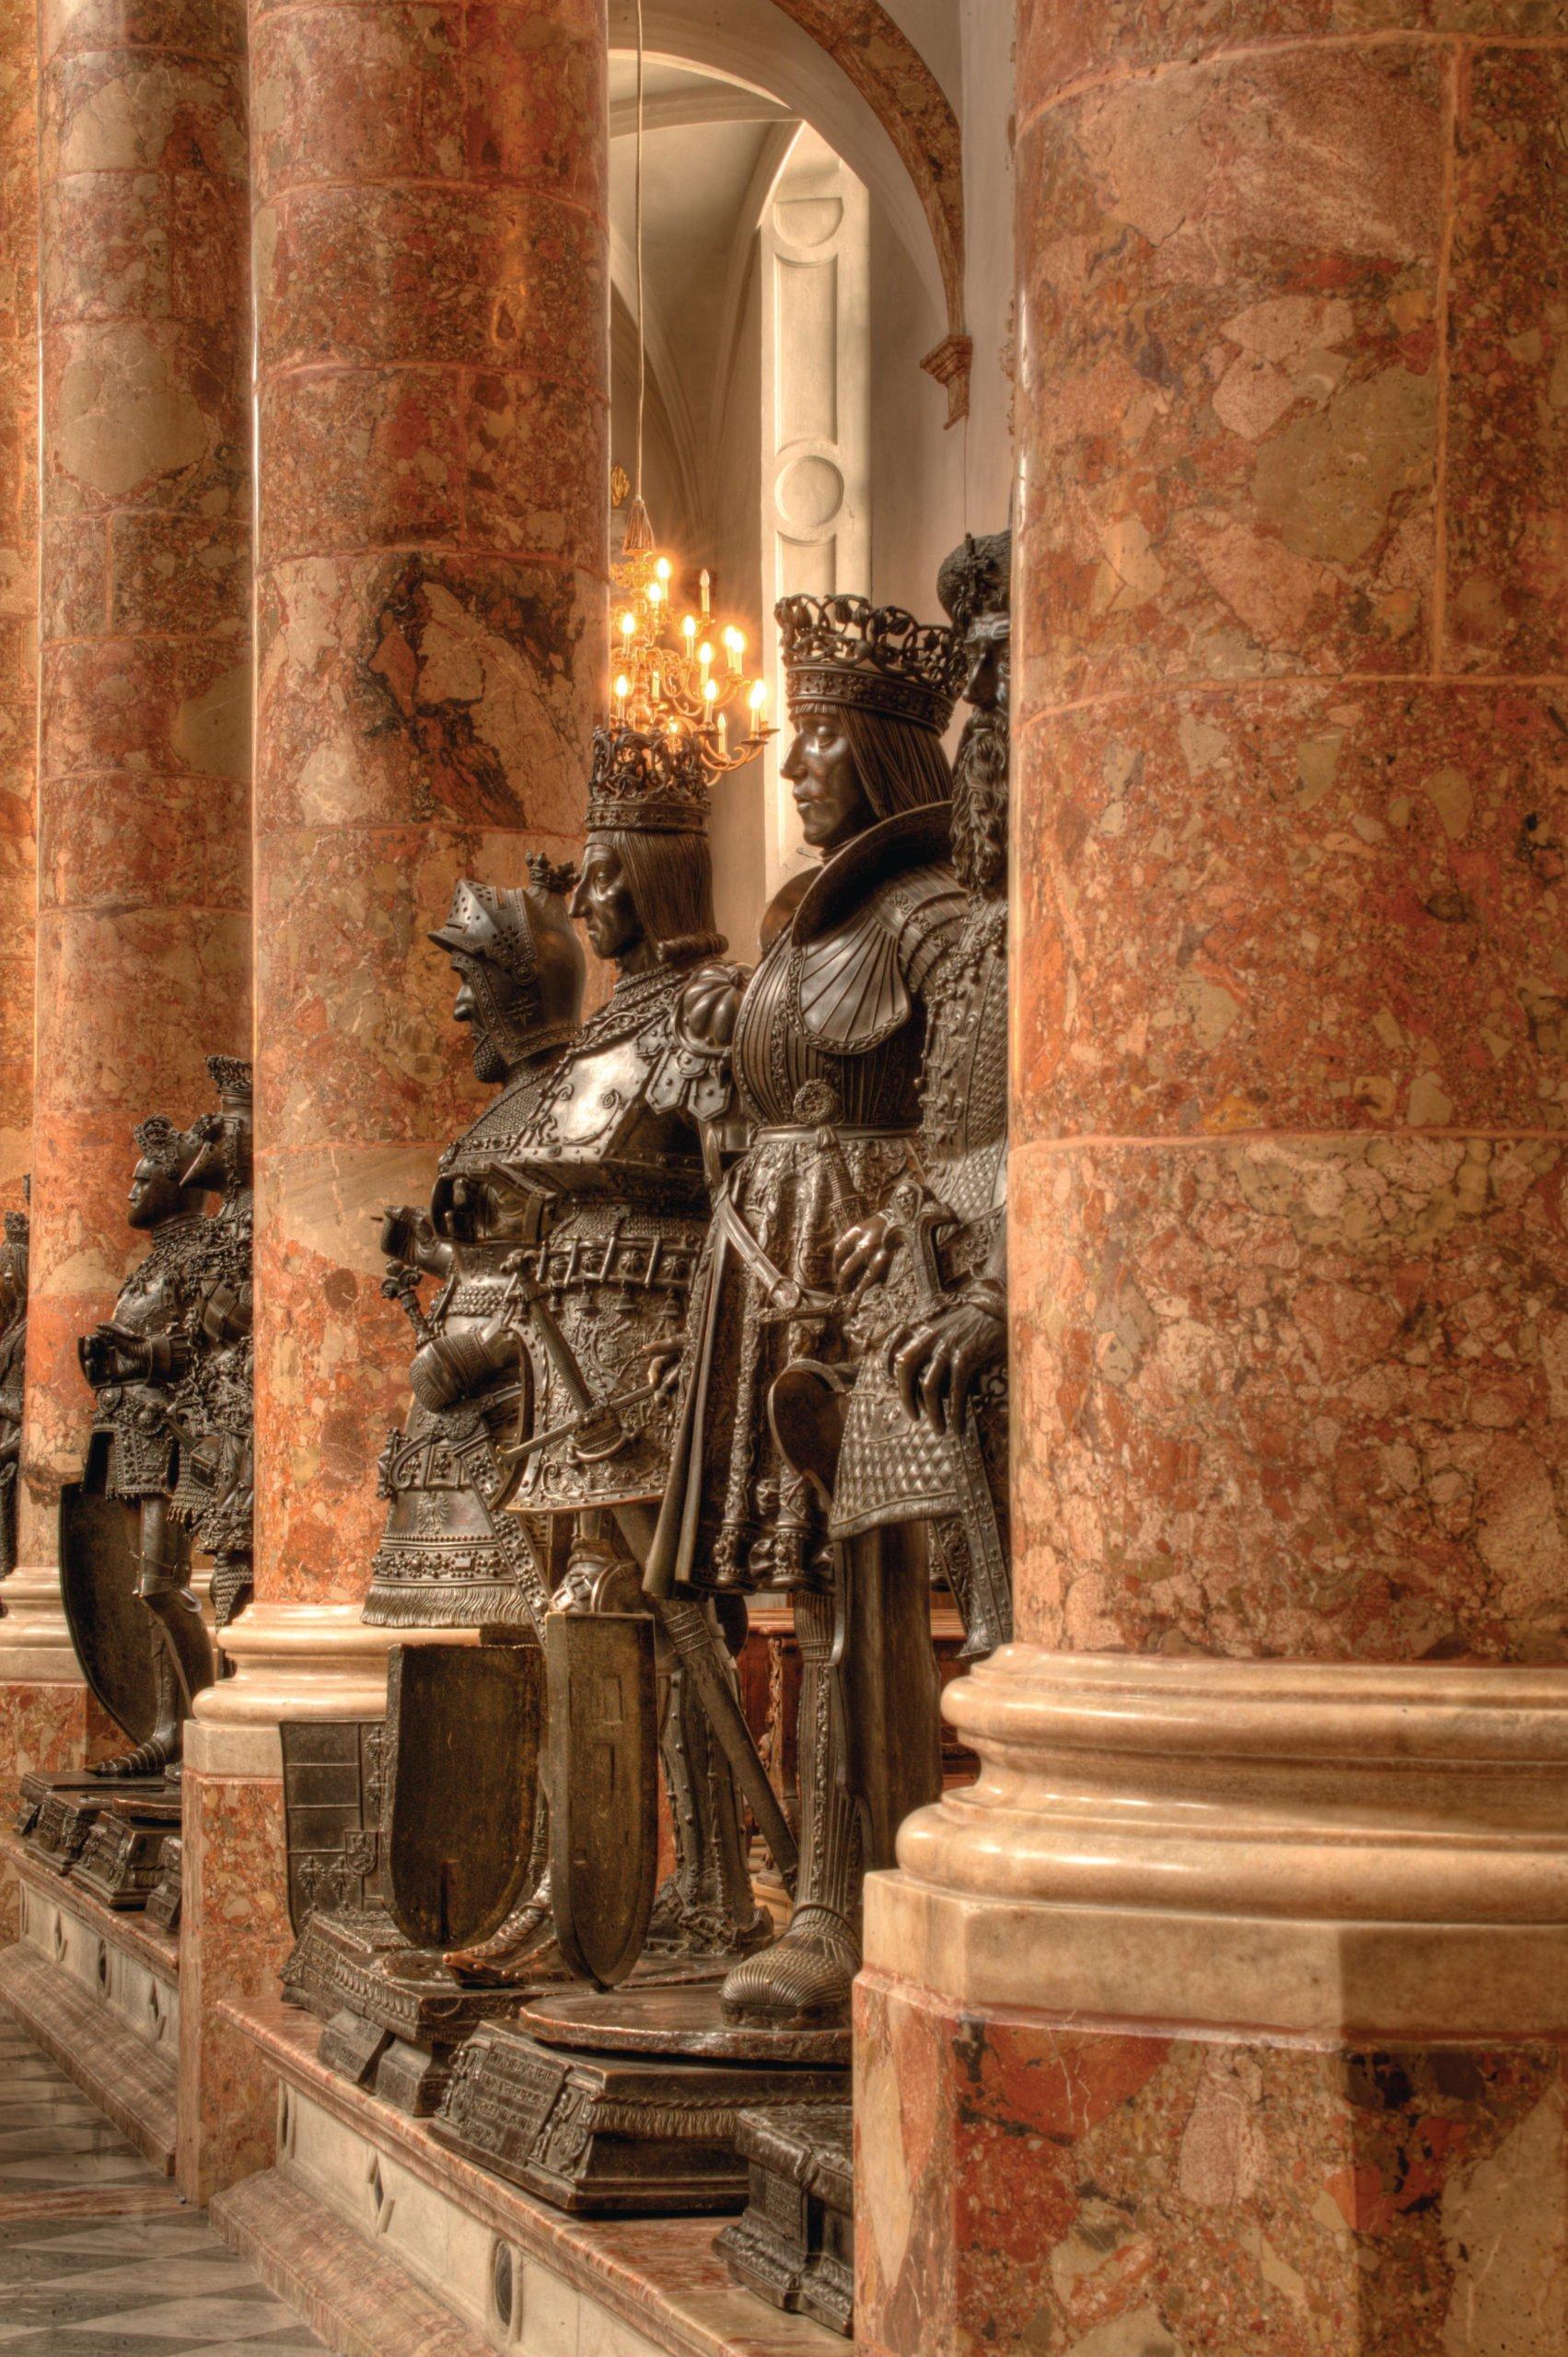 Things To Do in Innsbruck Hofkirche Statues